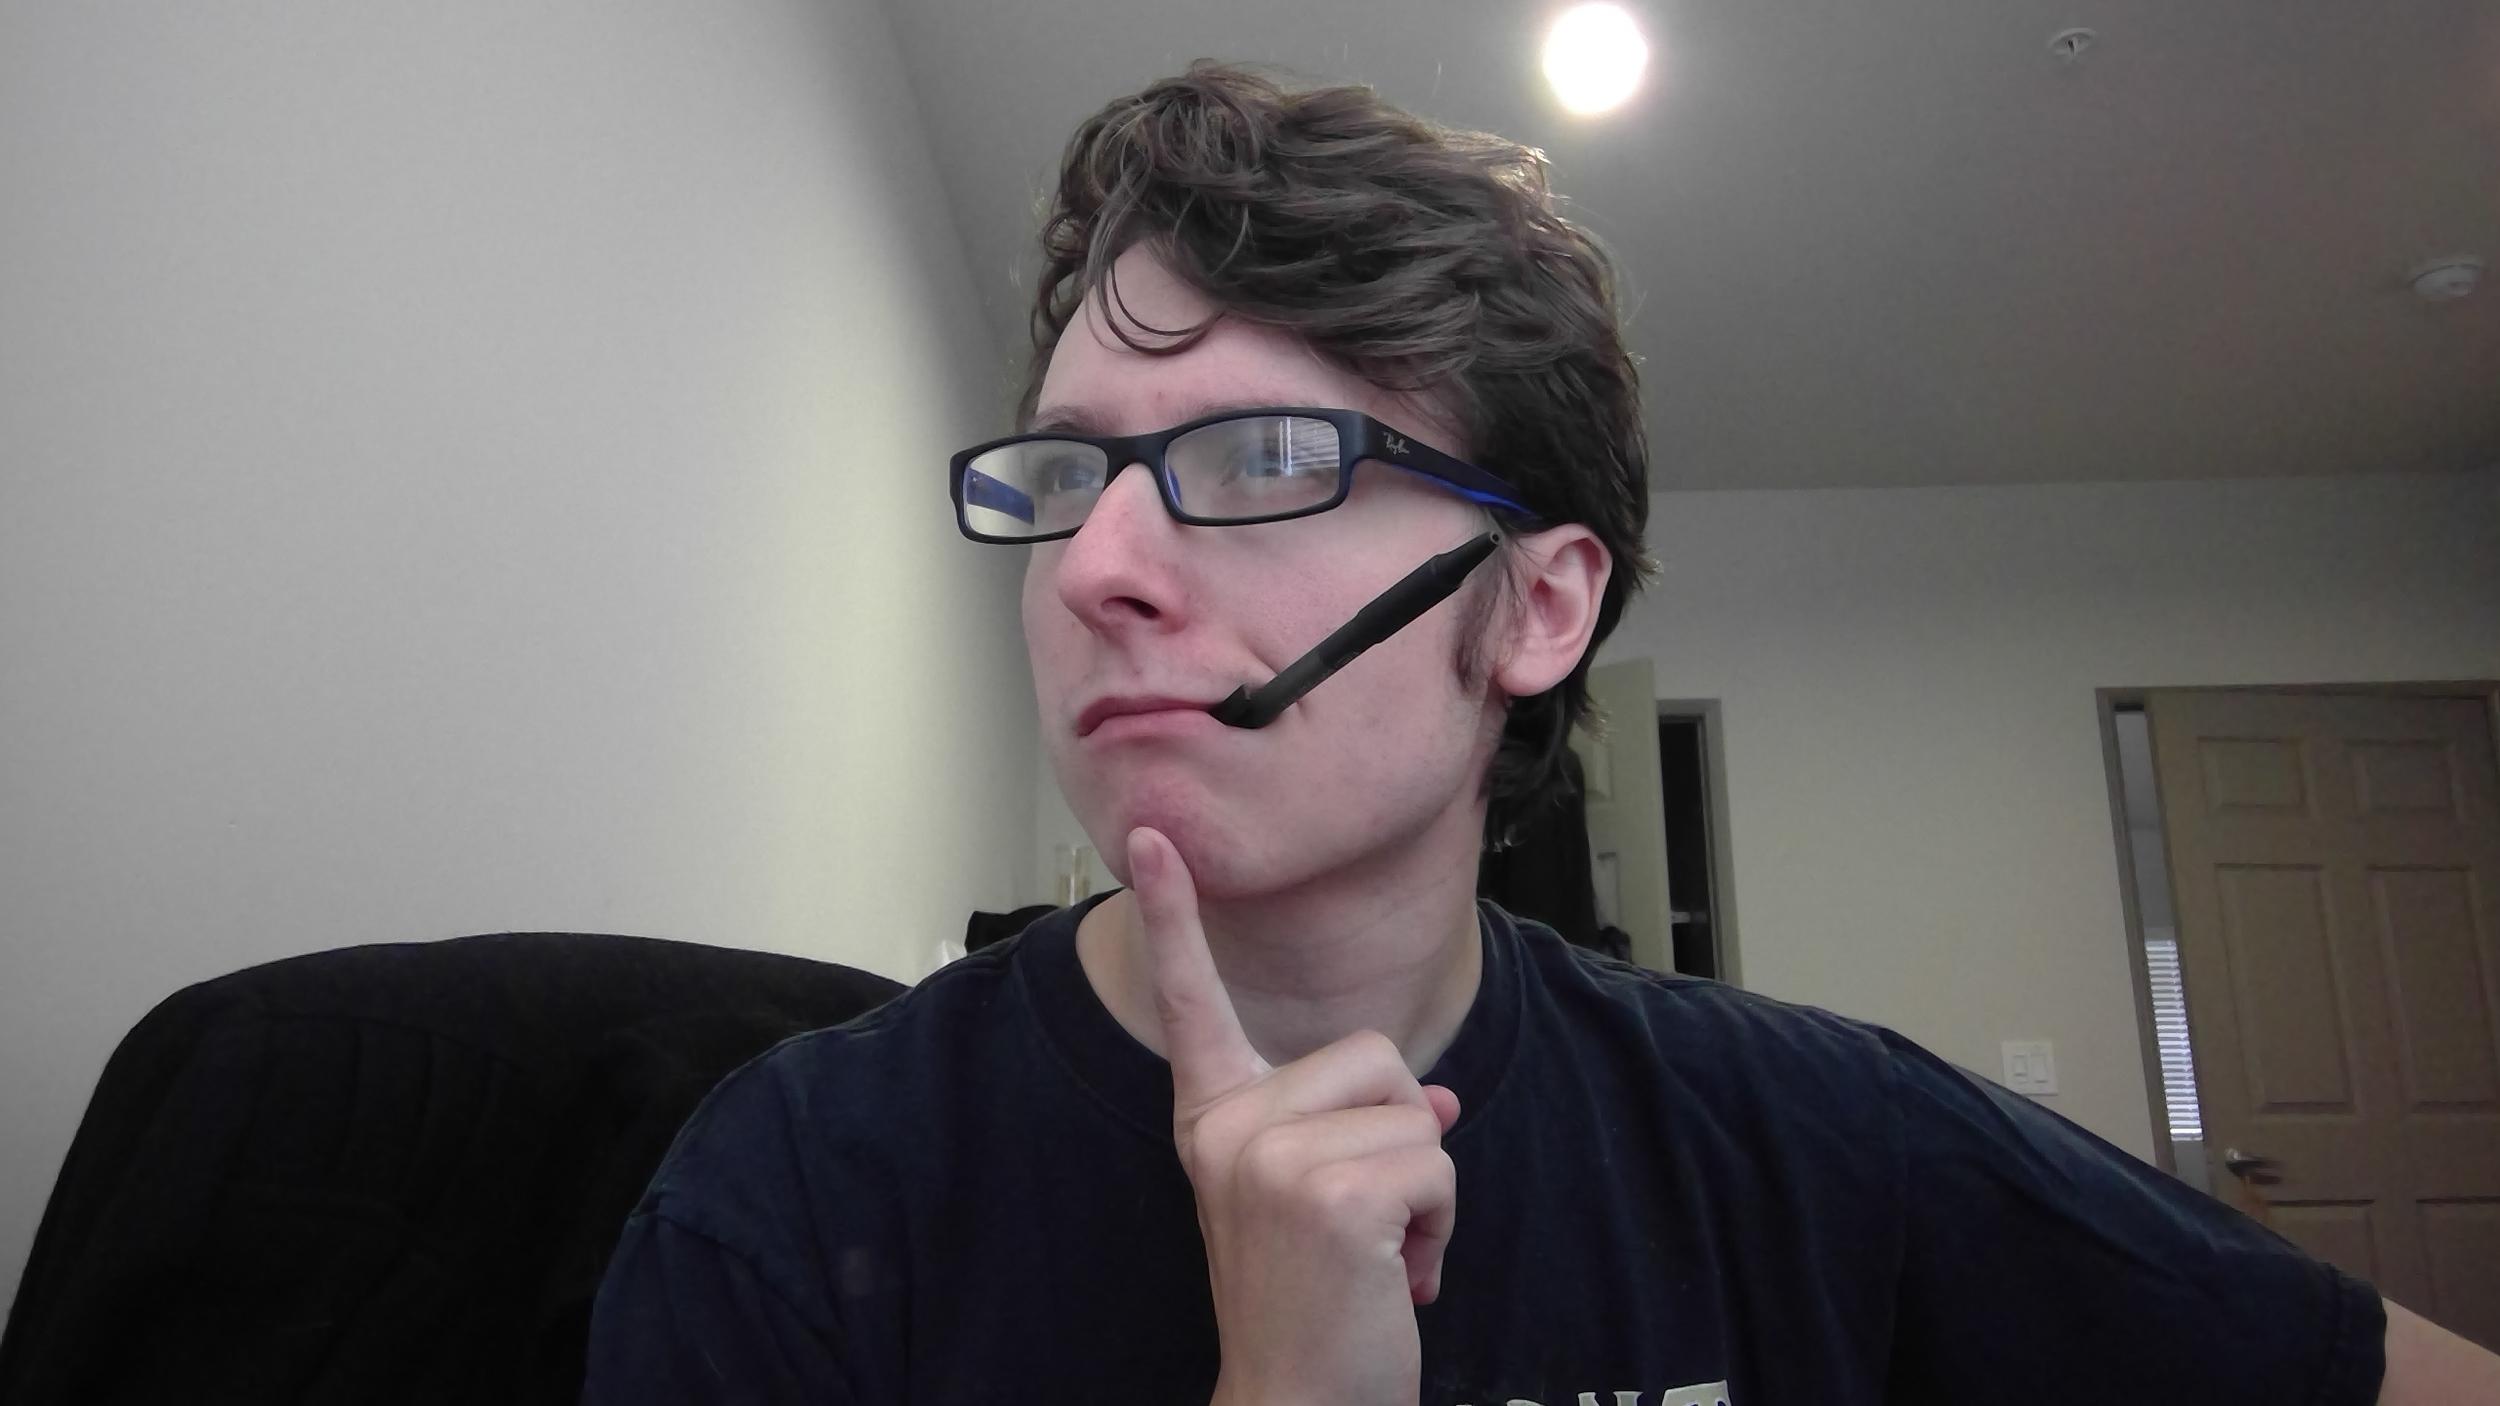 Do I look pretentious enough to make shitty similes?